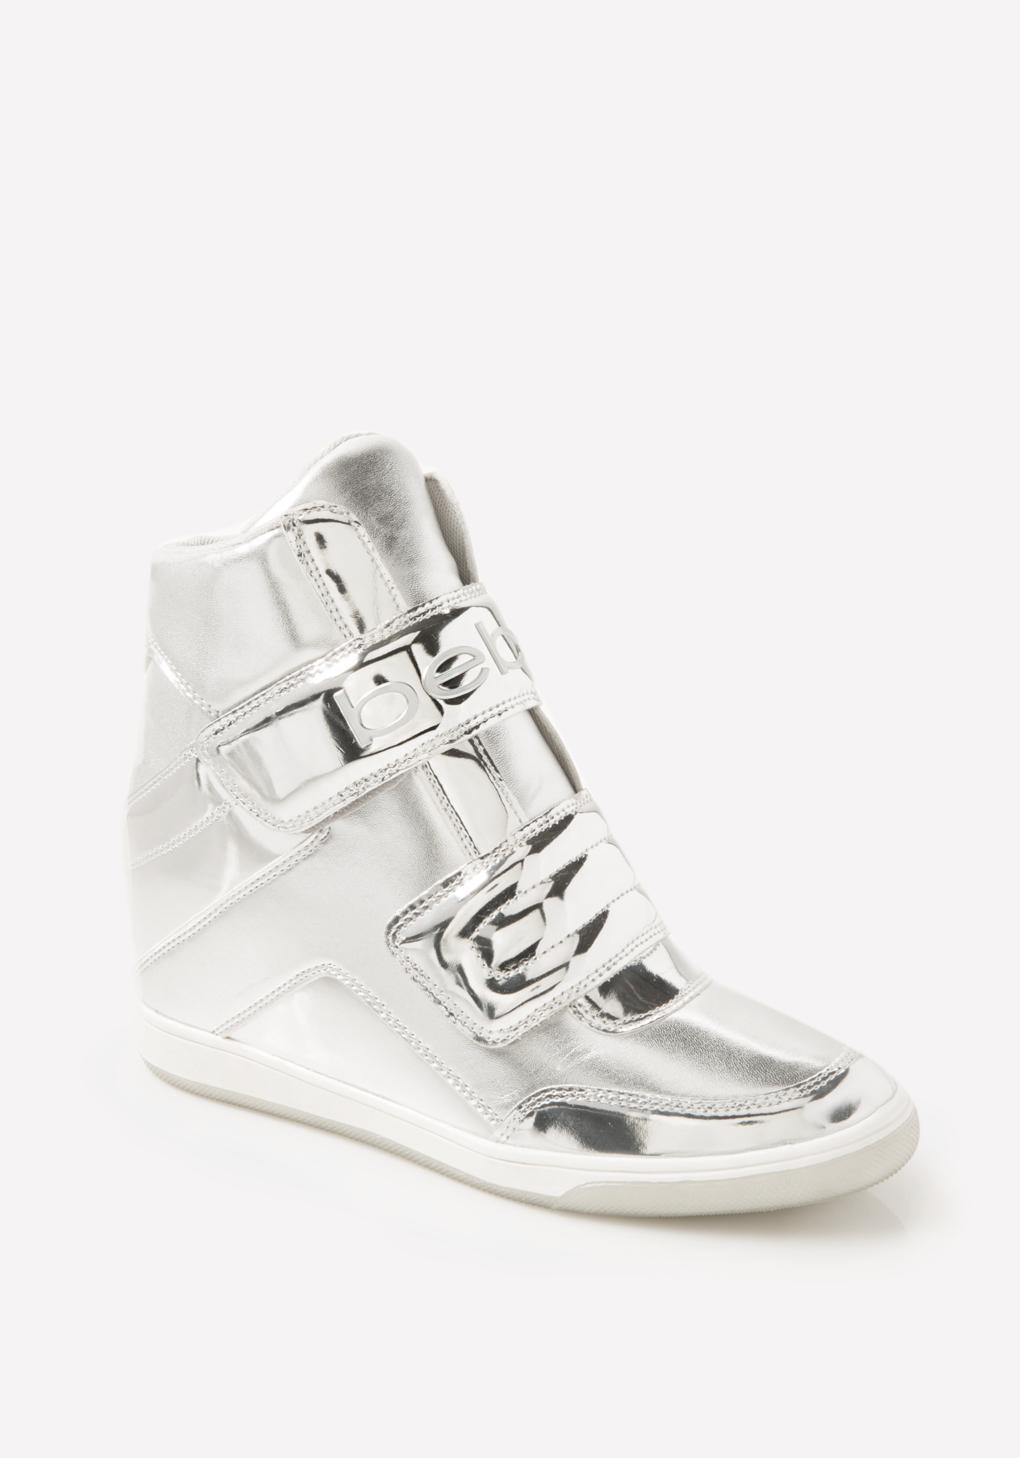 14d54a0b50a Bebe Cobble High Top Sneakers in Metallic - Lyst